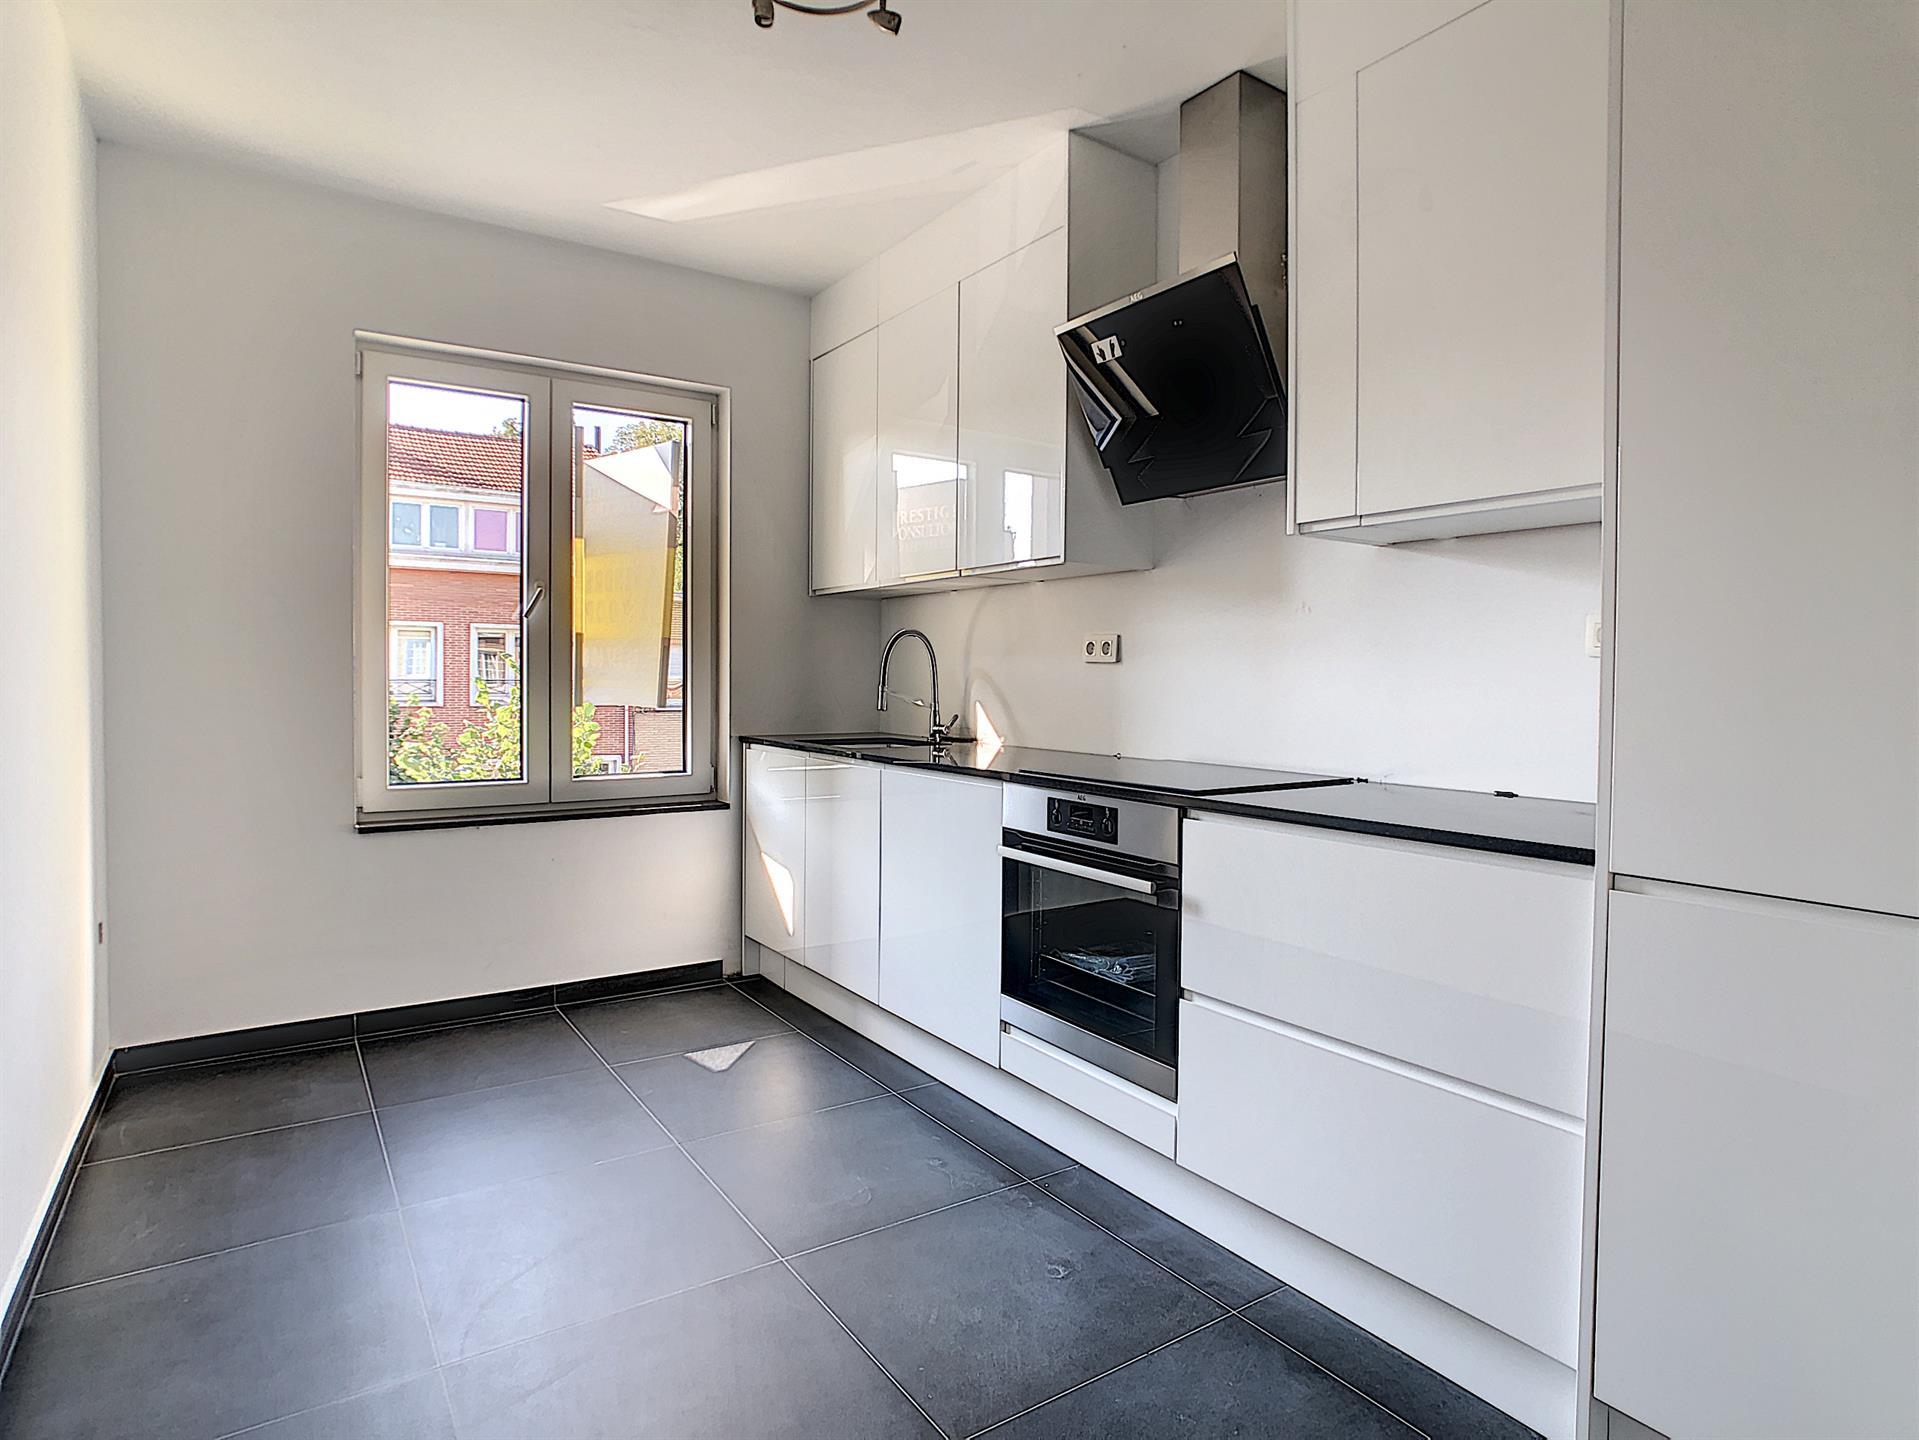 Appartement - Anderlecht - #4252376-27